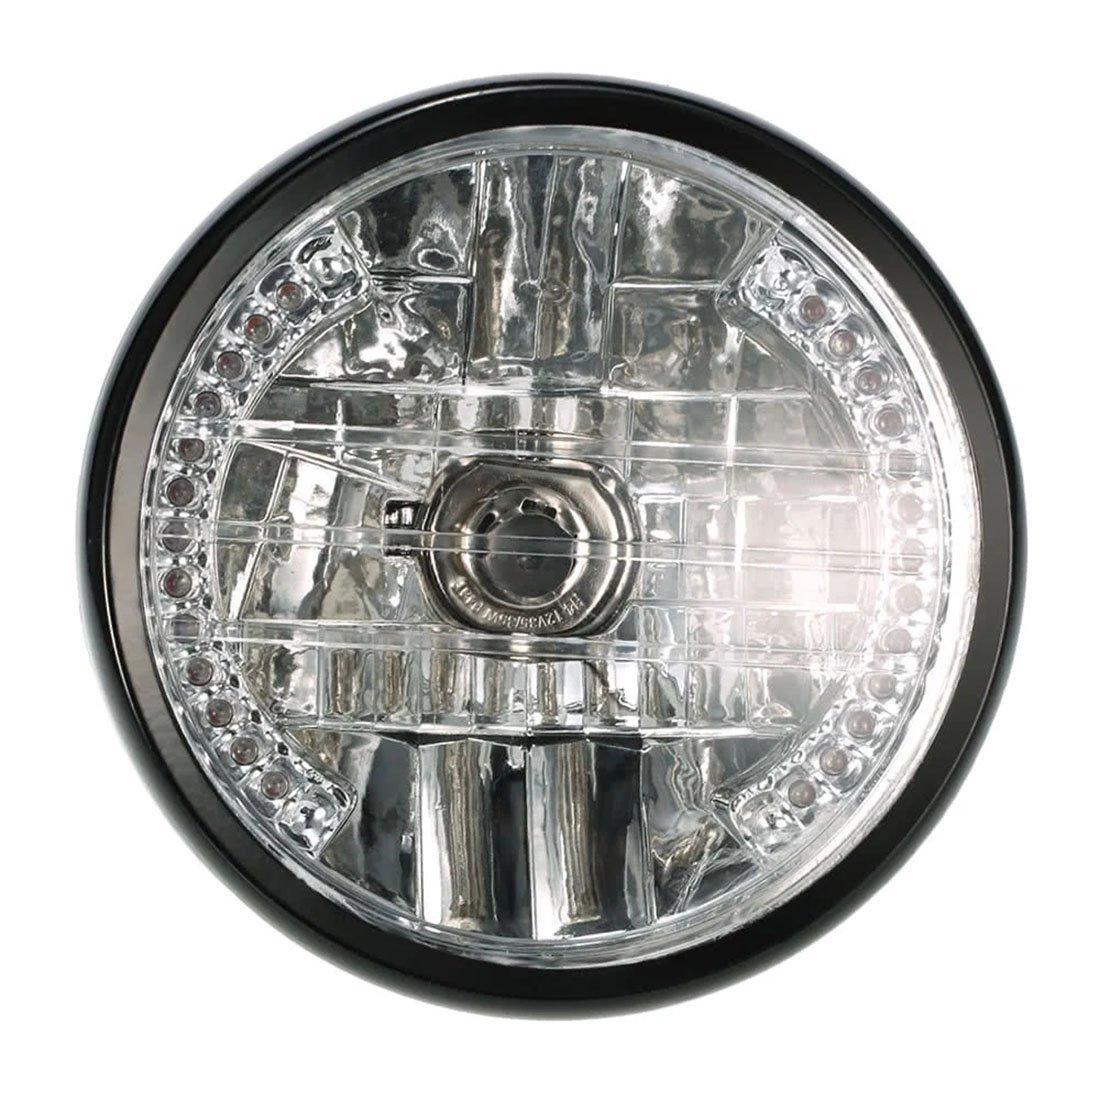 ZHUOYUE 1 Piece 7Inch Motorcycle Headlight Round 35W 3000K Motorcycle Headlight LED Turn Signal Indicators Light Universal